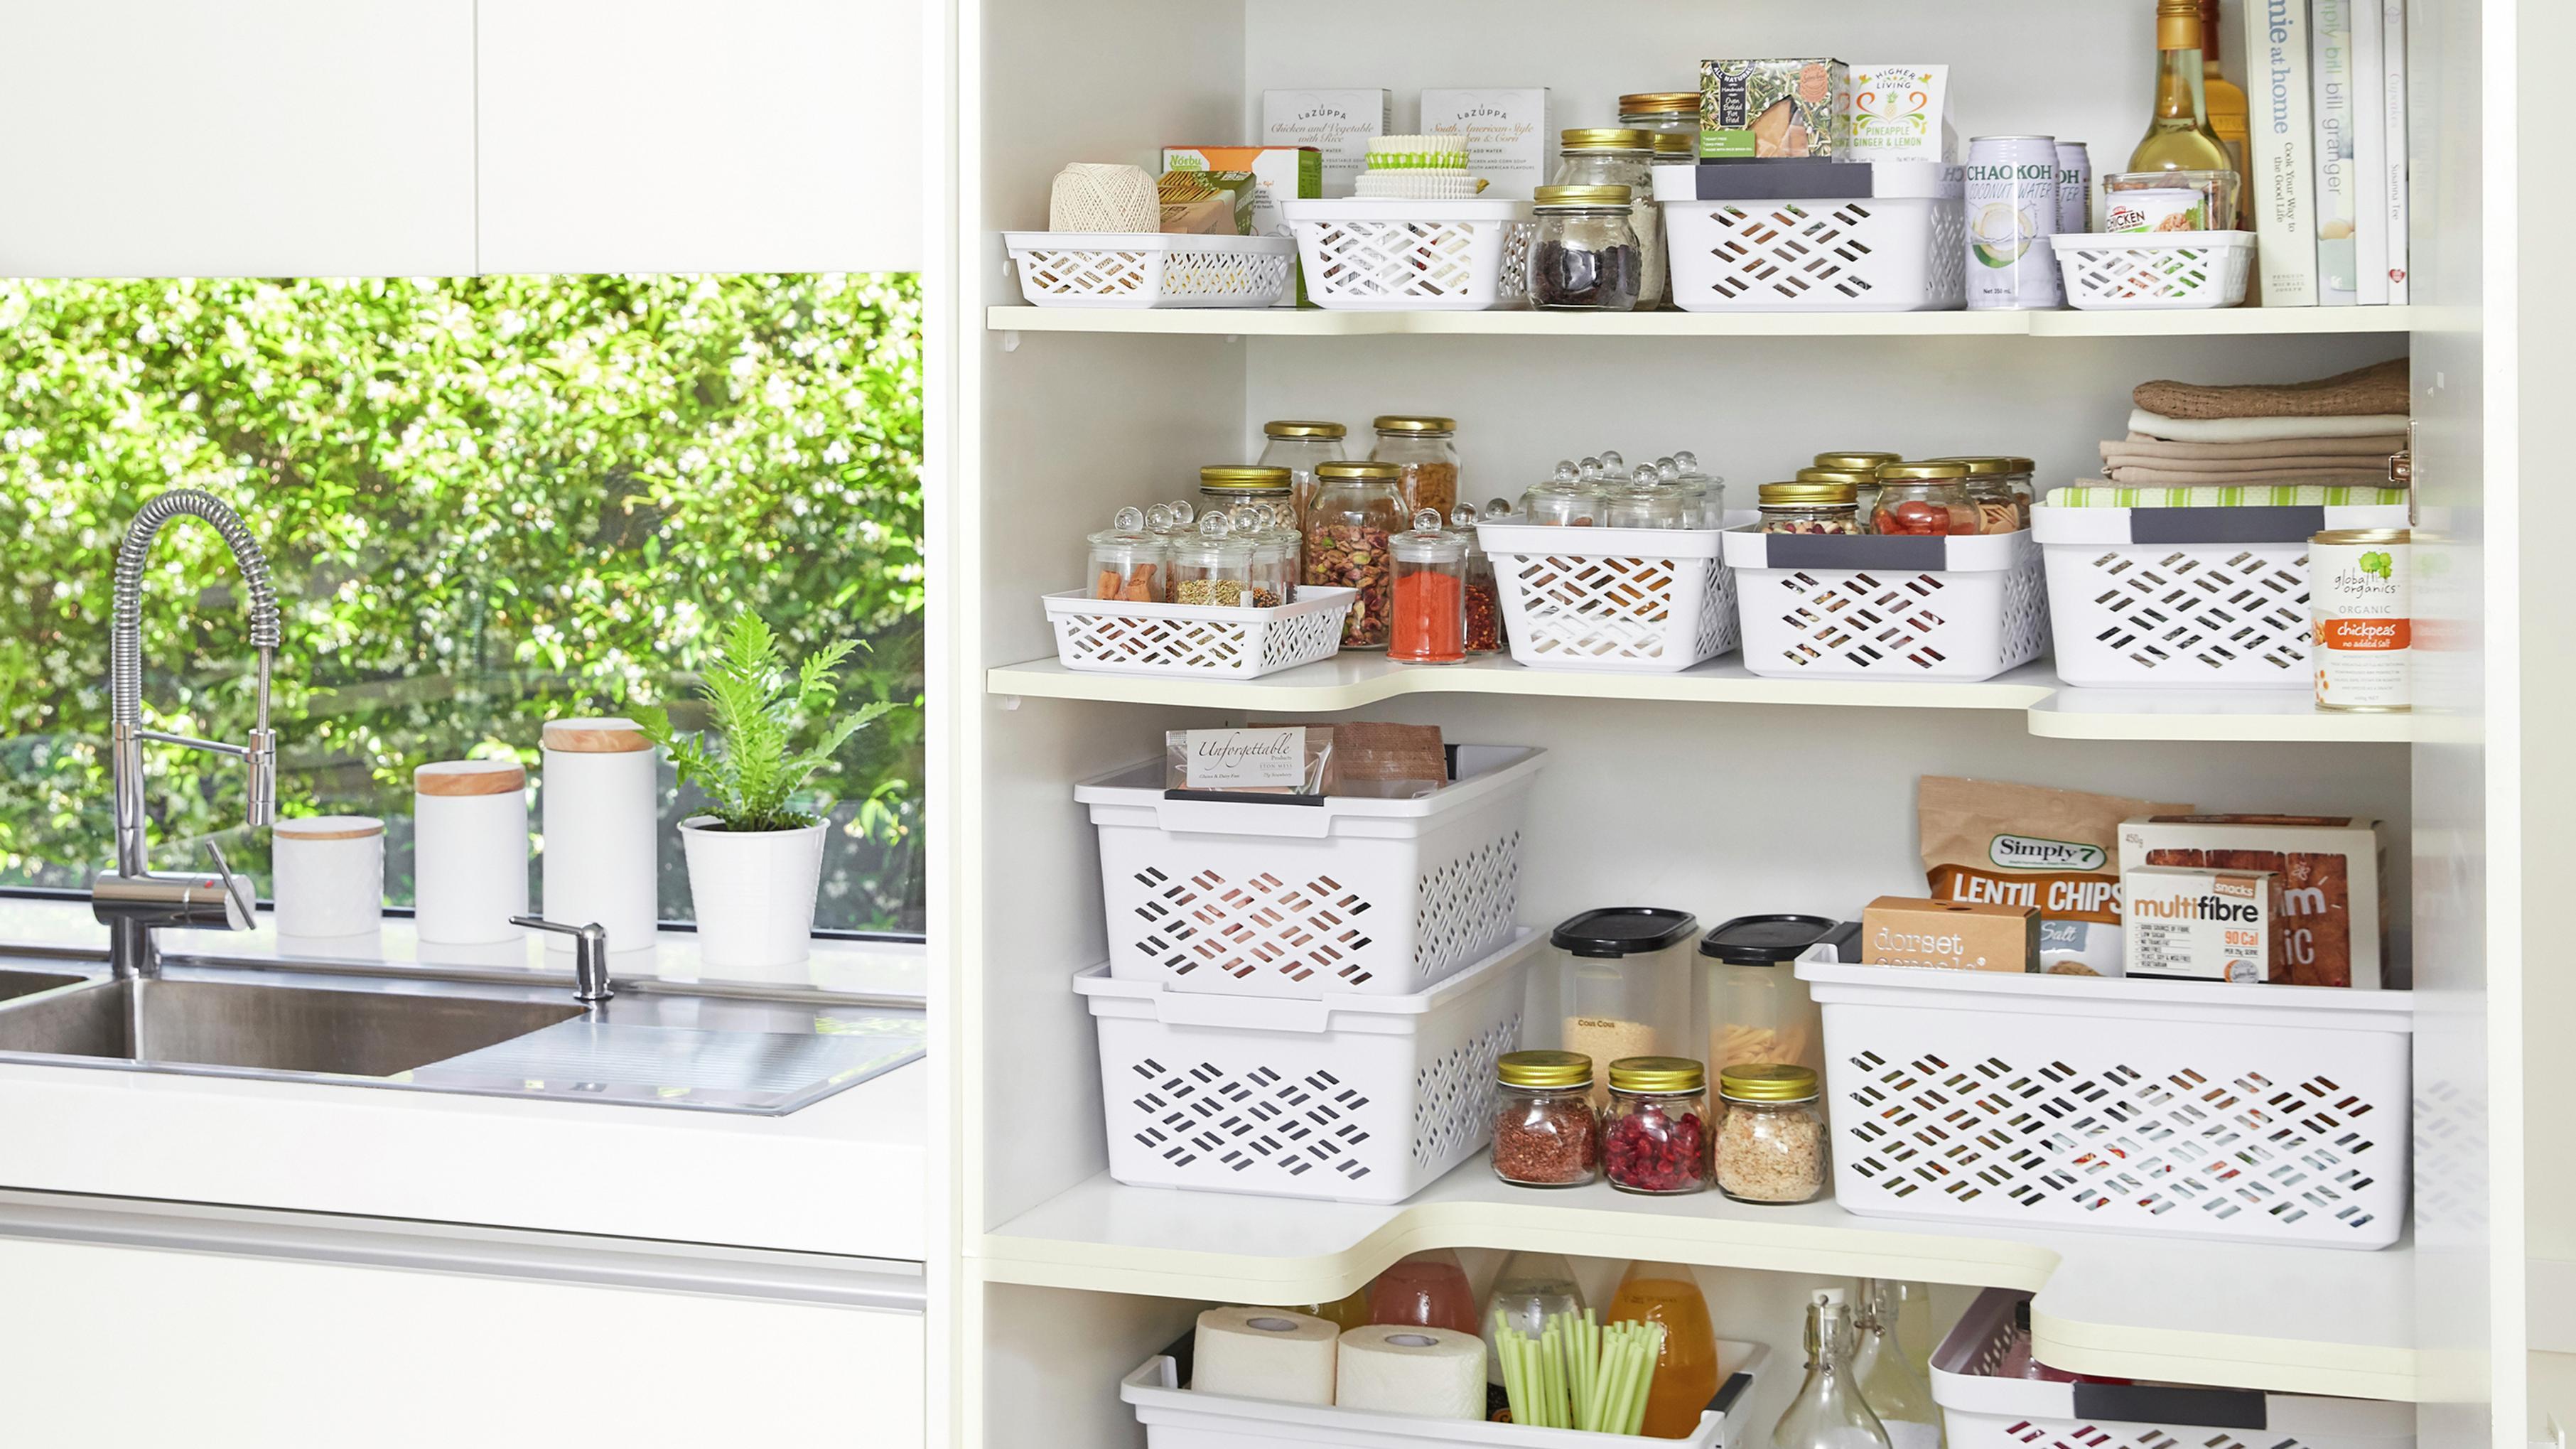 Kitchen pantry with storage baskets.